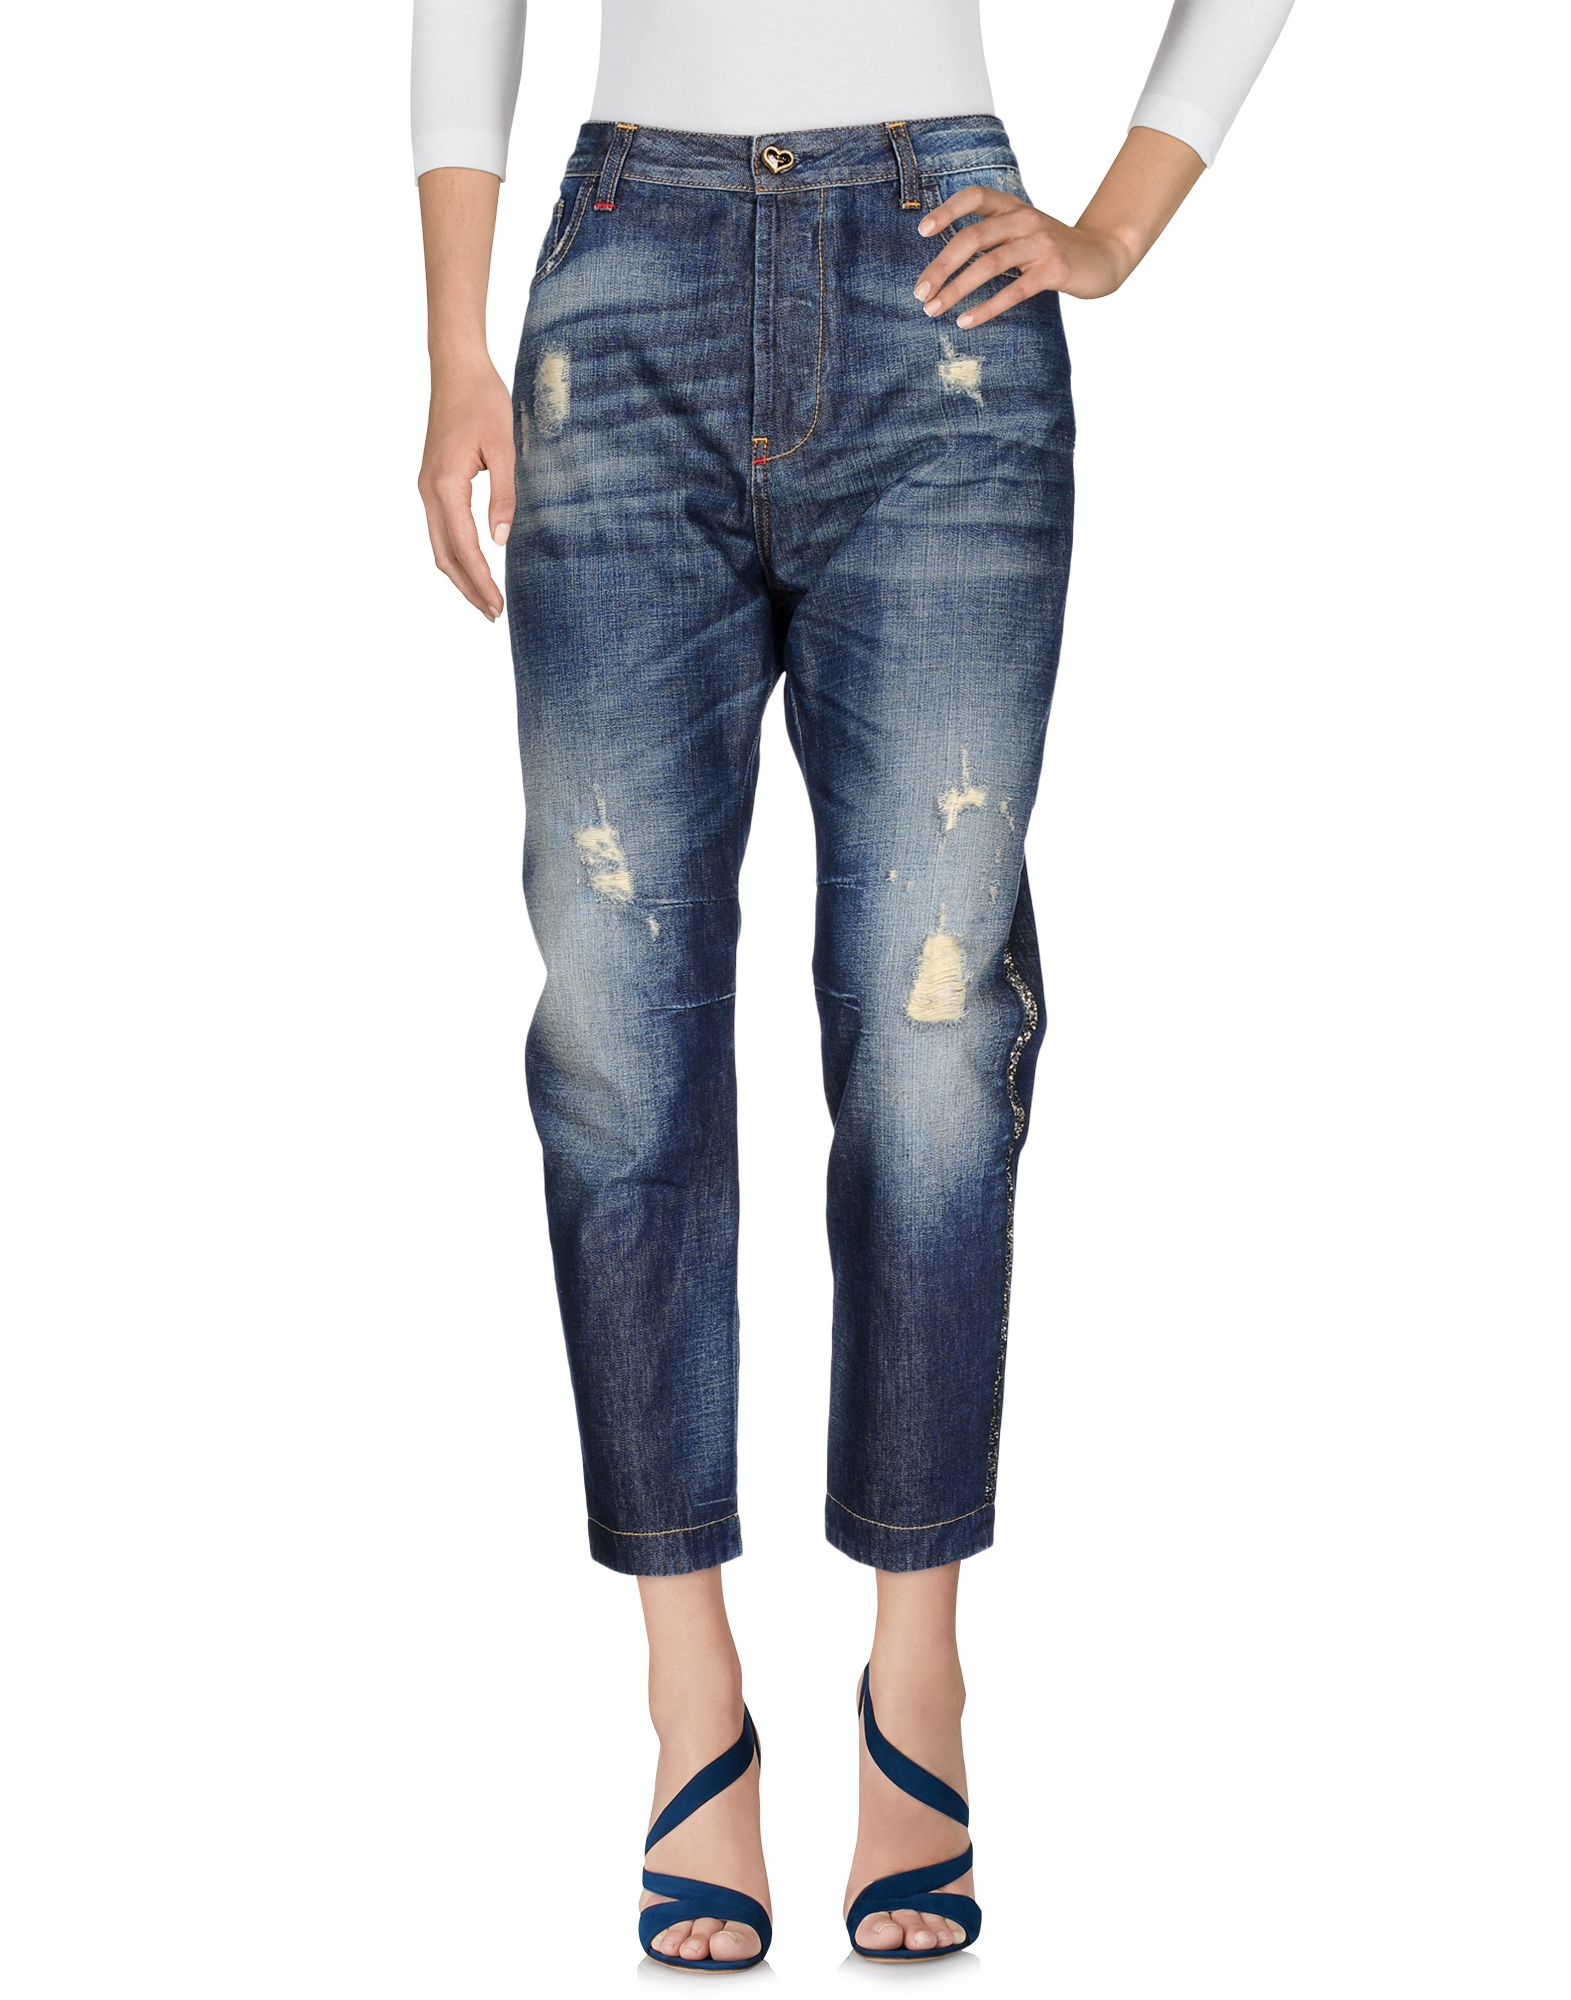 TWIN-SET JEANS Damen Jeanshose Farbe Blau Größe 6 jetztbilligerkaufen